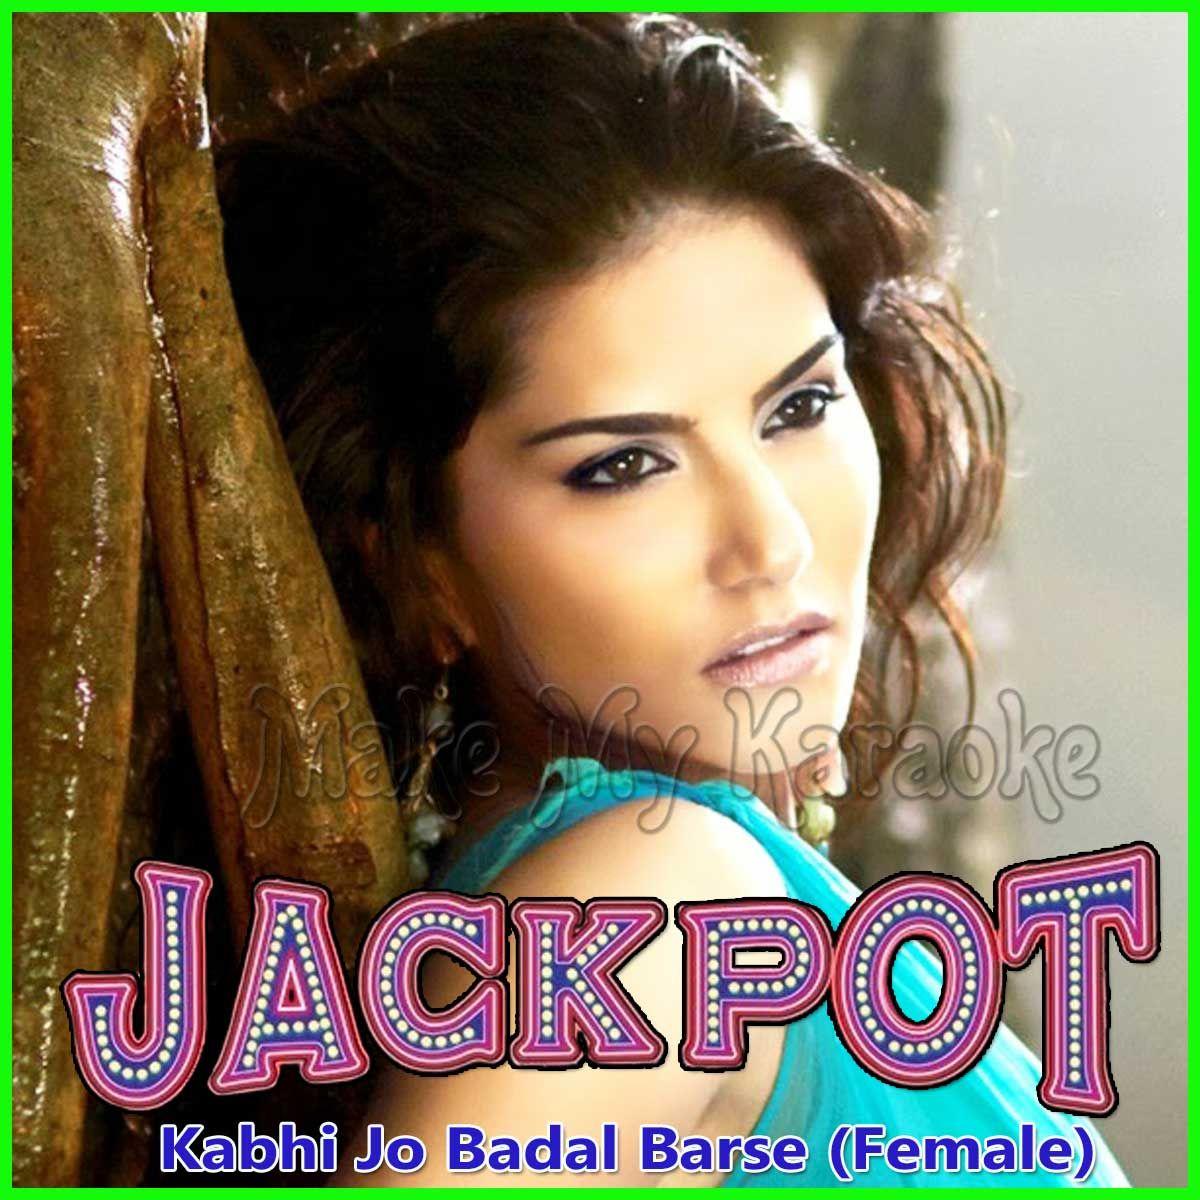 Kabhi Jo Badal Barse Female Version Jackpot Mp3 And Video Karaoke Format Karaoke Jackpot Karaoke Songs